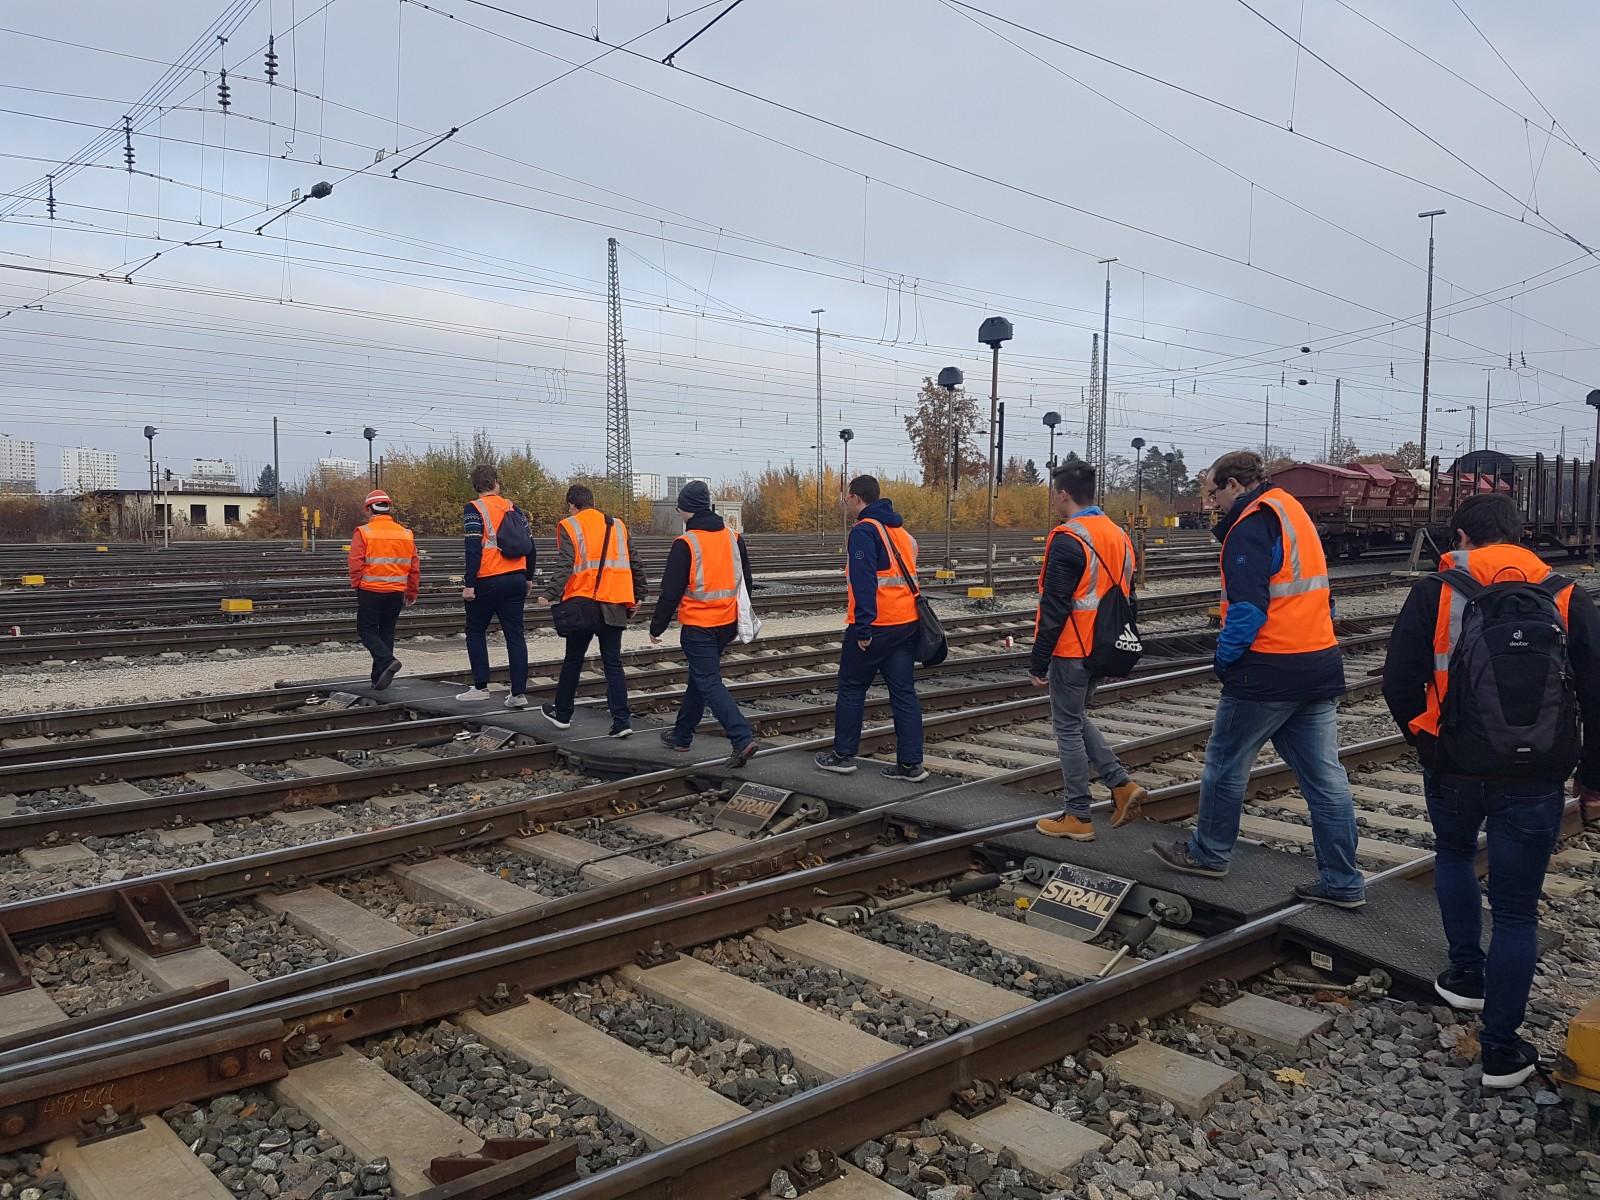 Herbstexkursion nach Nürnberg 2018